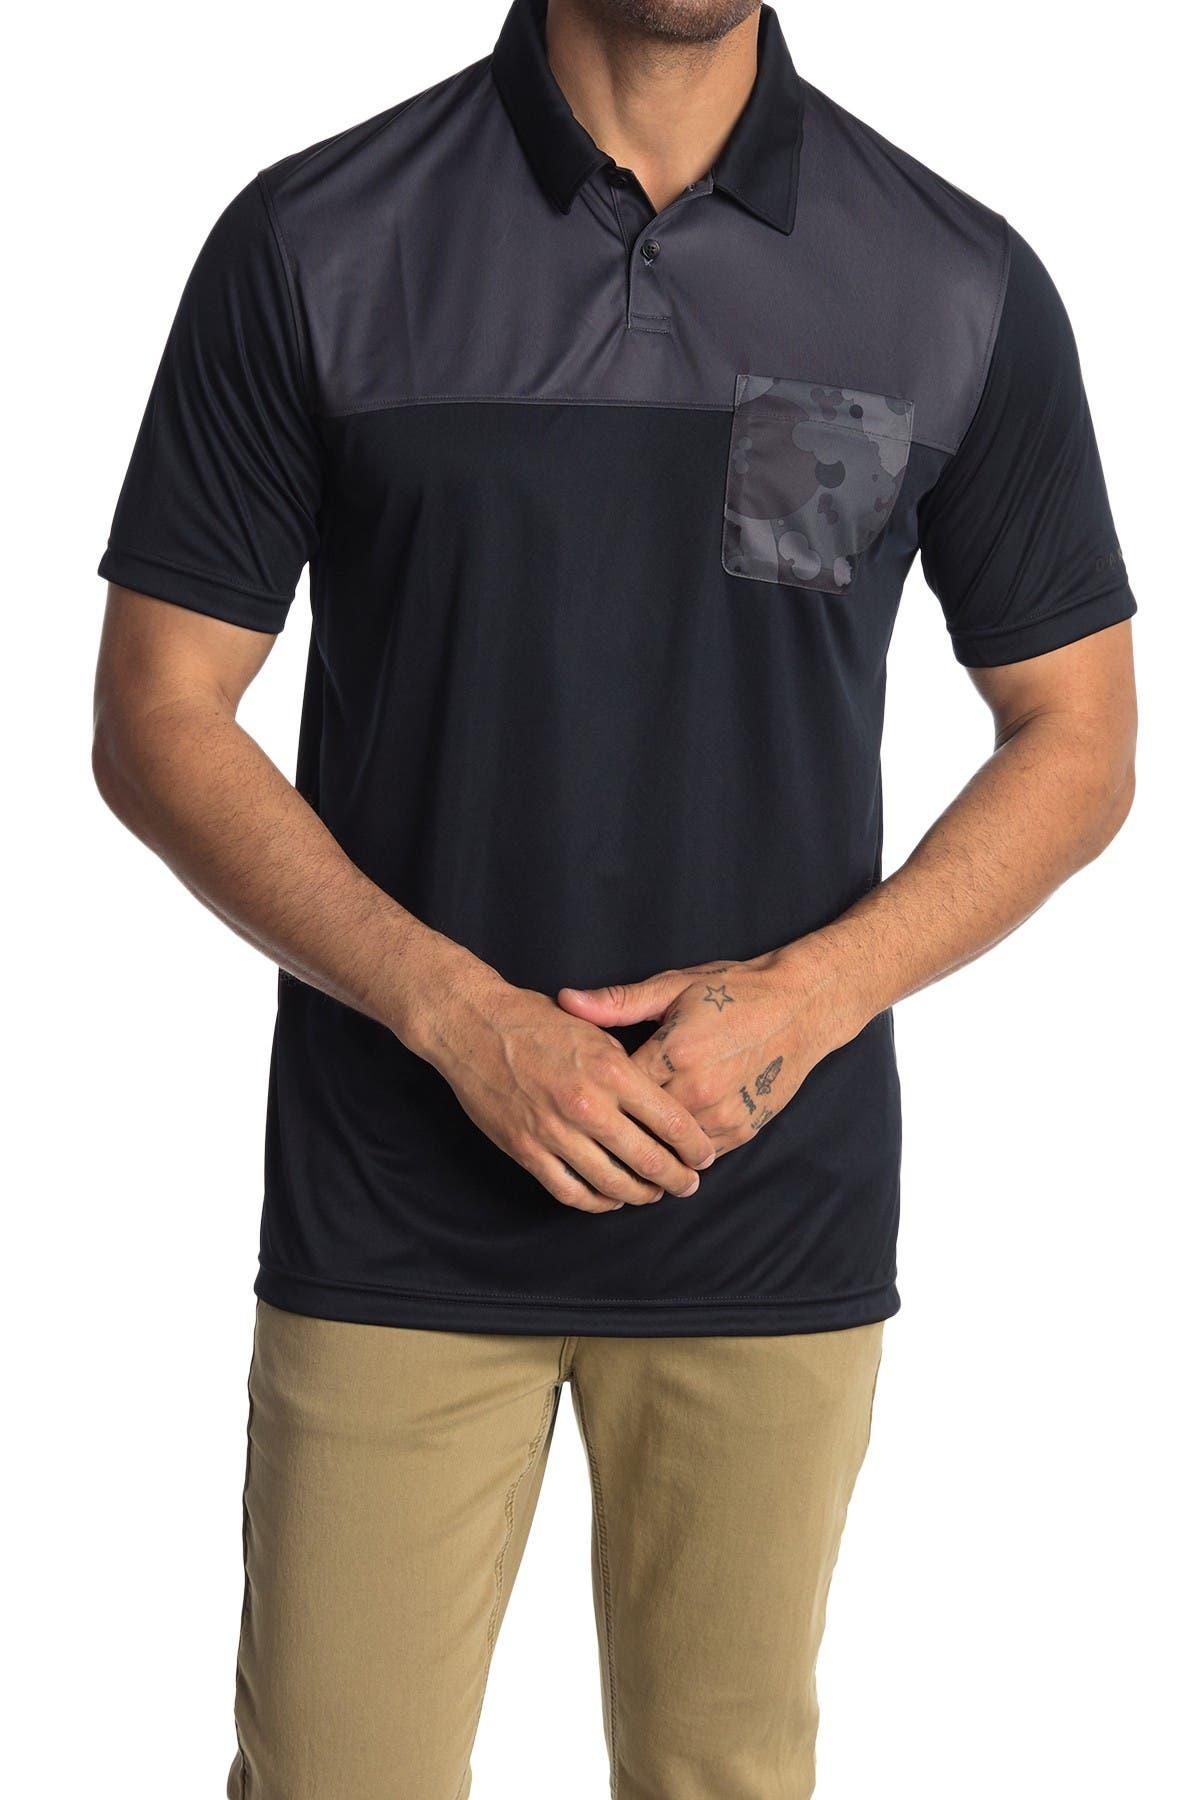 Image of Oakley Camo Evo Pocket Polo